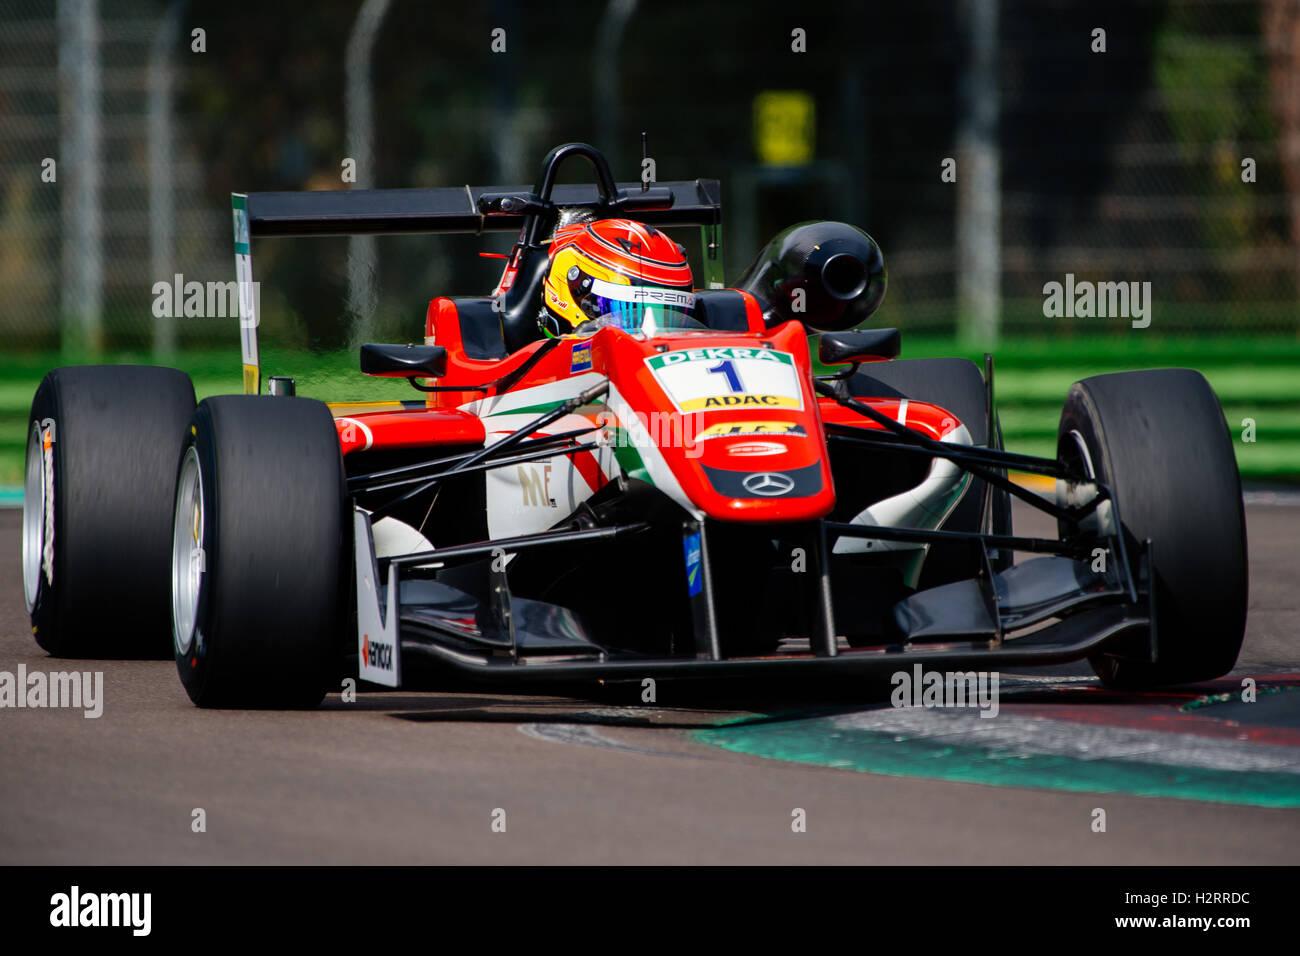 Imola Italy 02nd Oct 2016 Prema Powerteam S Driver Lance Stroll Stock Photo Alamy